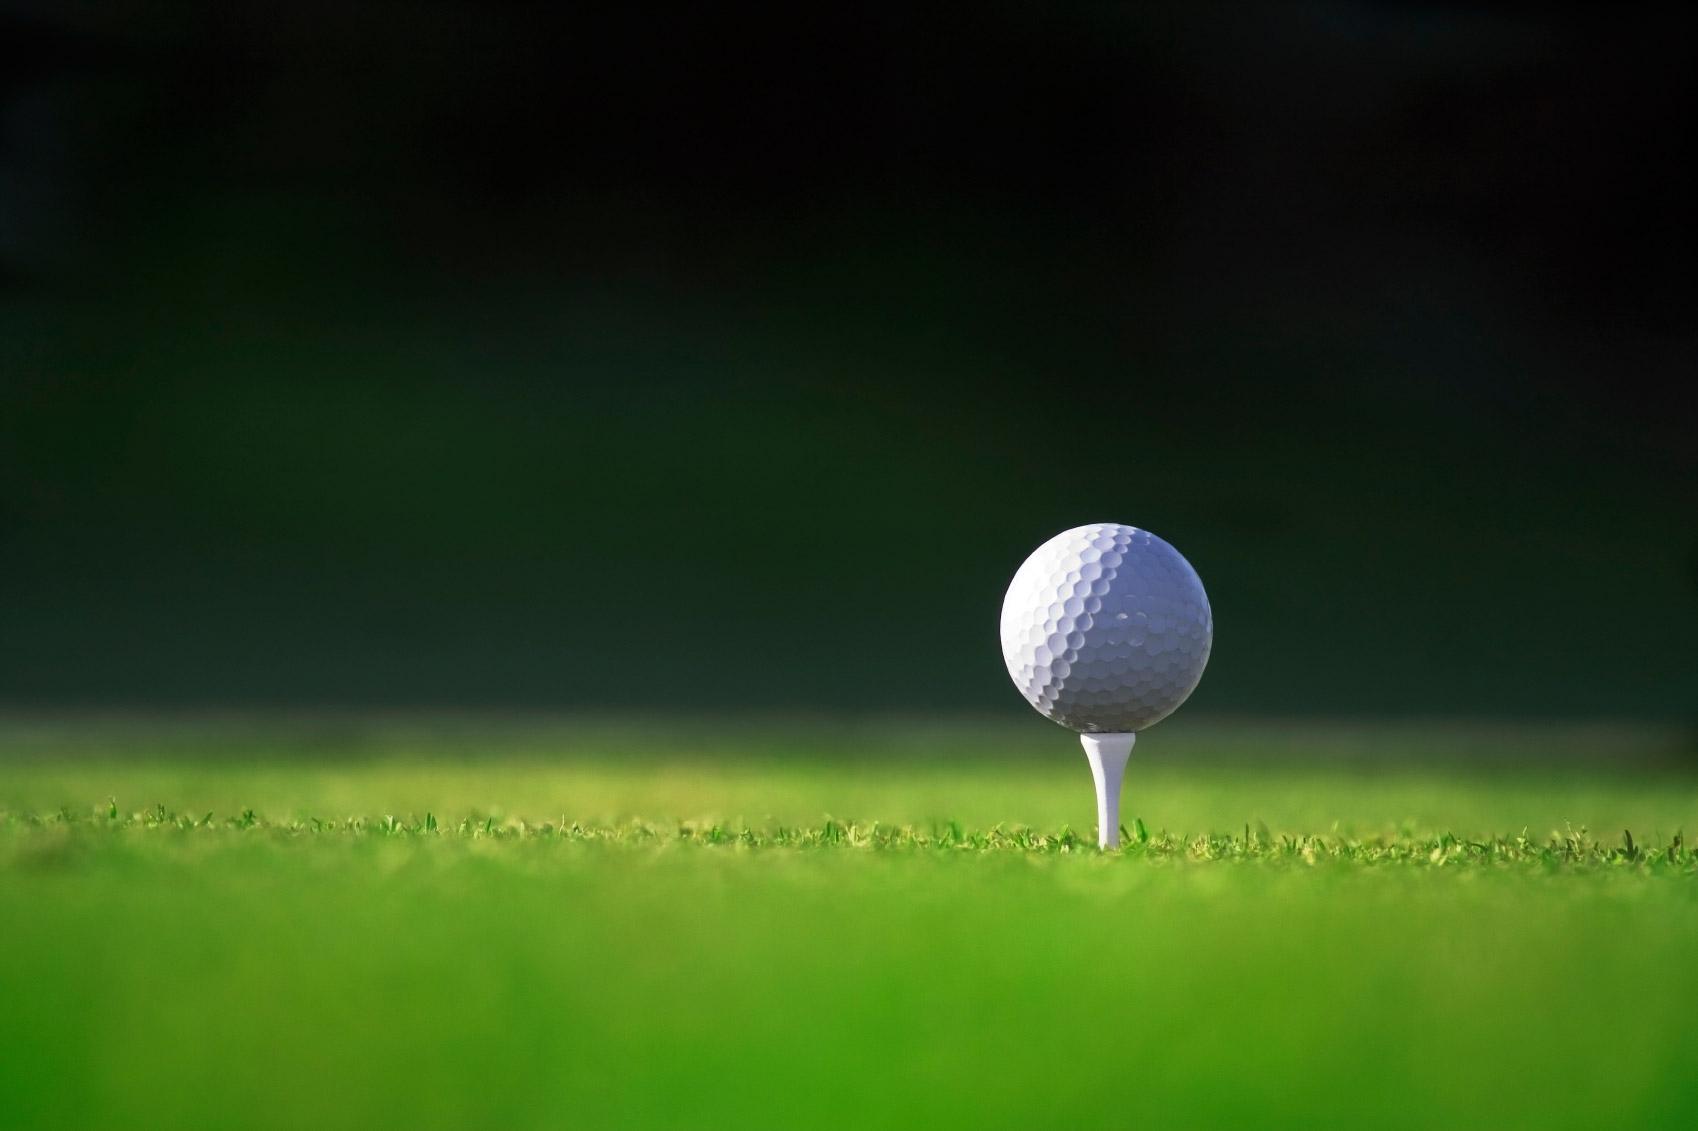 Golf Theme Wallpaper - WallpaperSafari